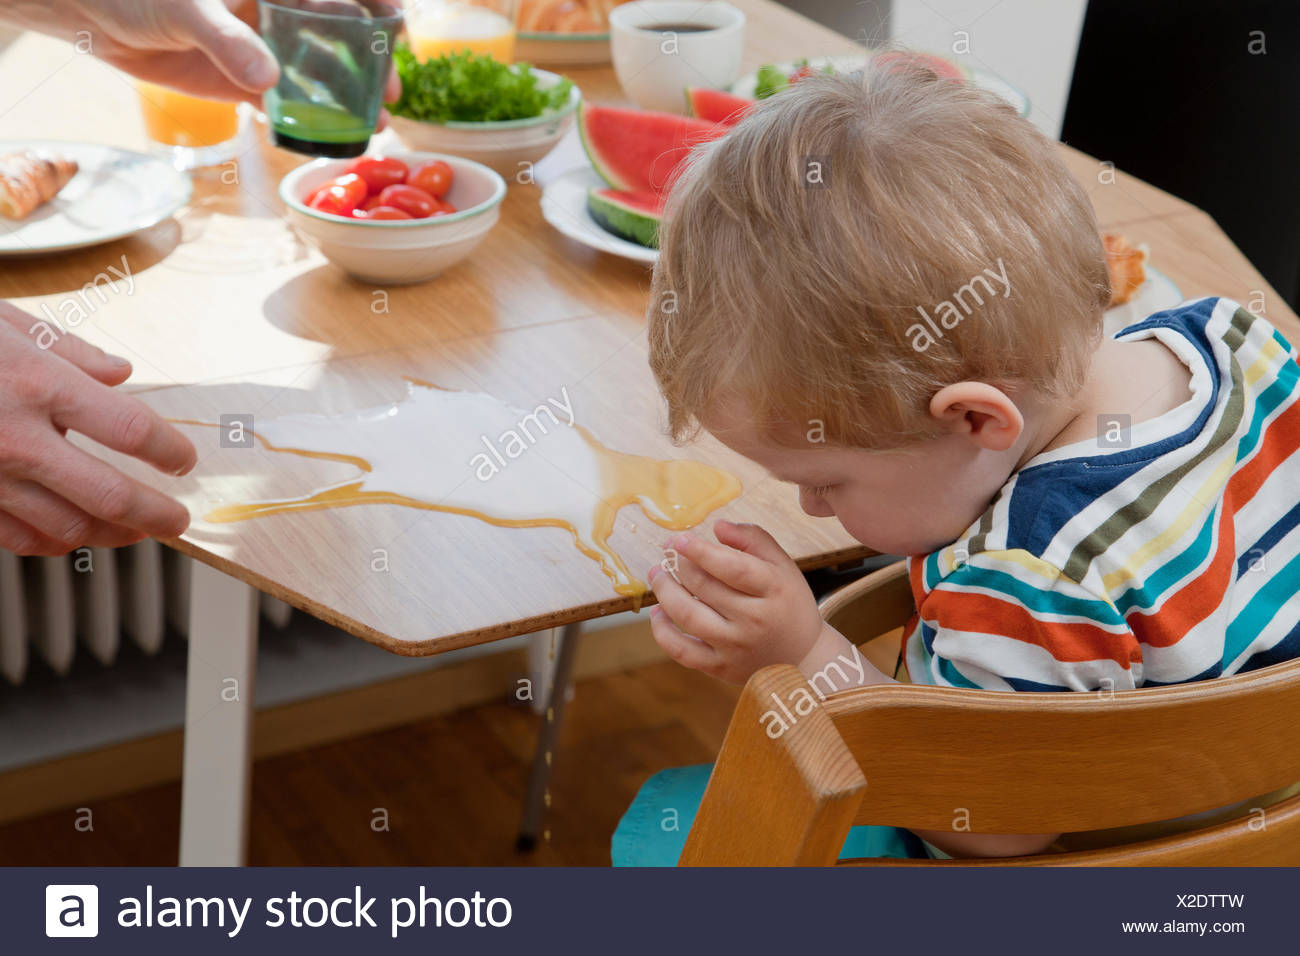 Male toddler accidentallyspilling orange juice at breakfast table - Stock Image